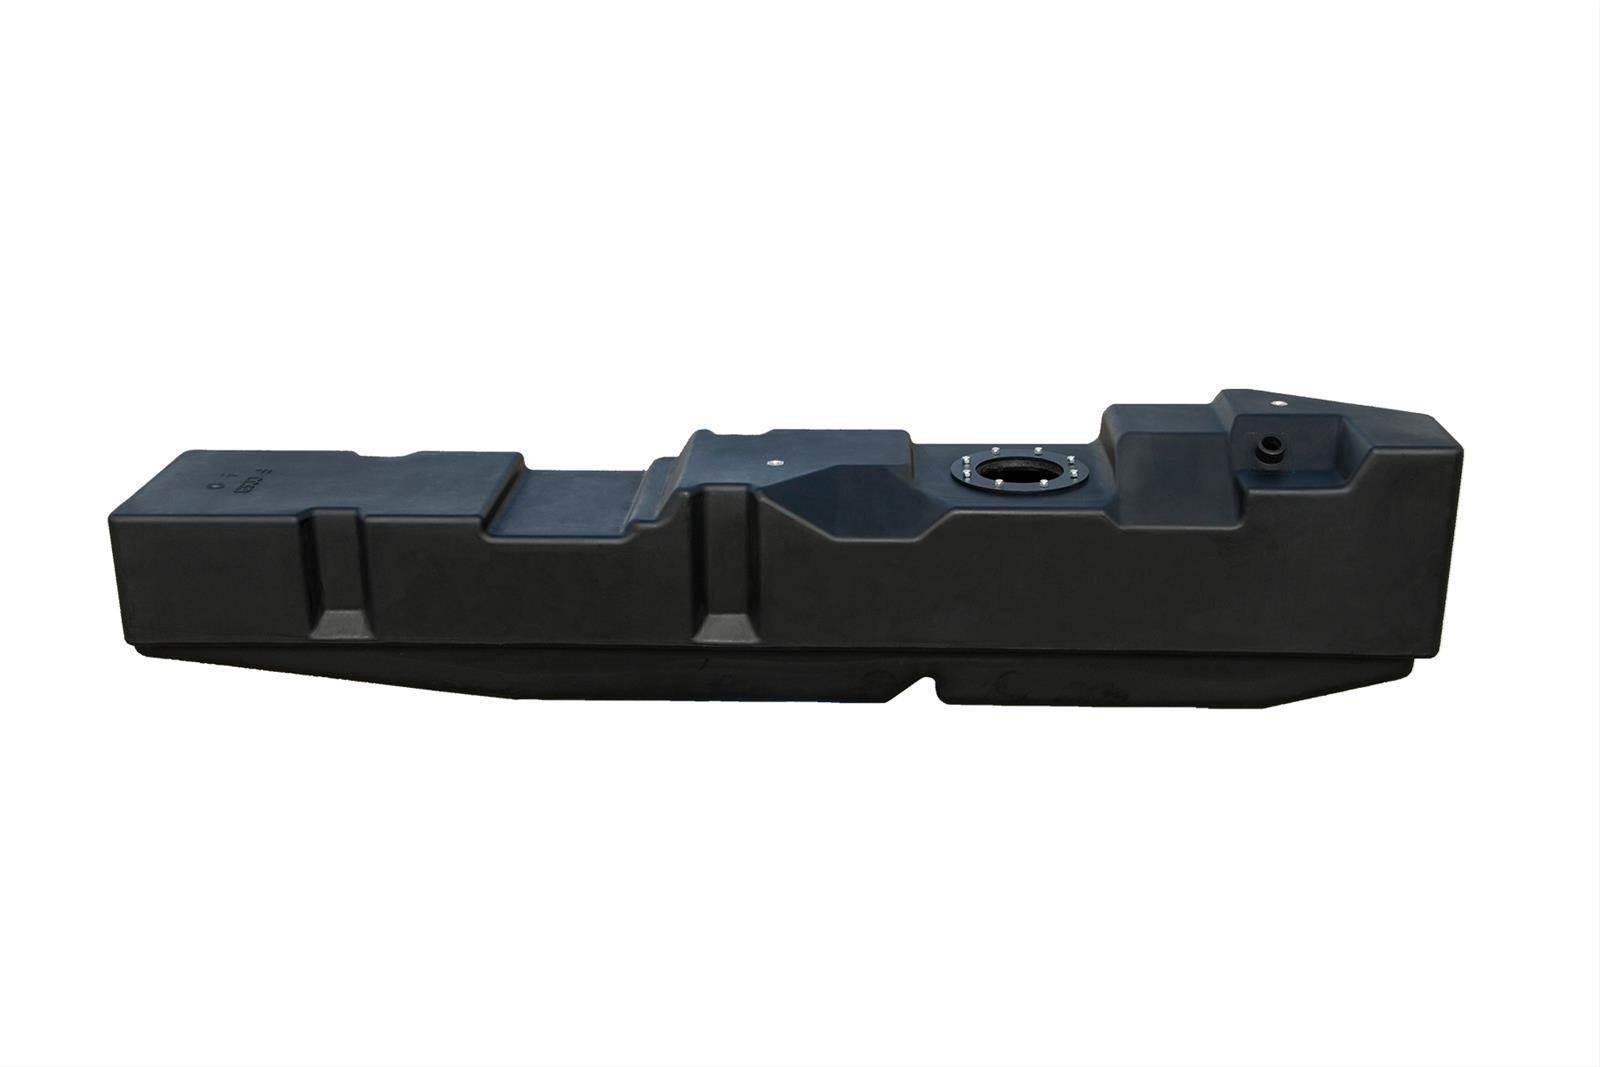 7020299 - Titan 51 Gallon Mid-Ship Fuel Tank - Ford 1999-2007 CC/SB